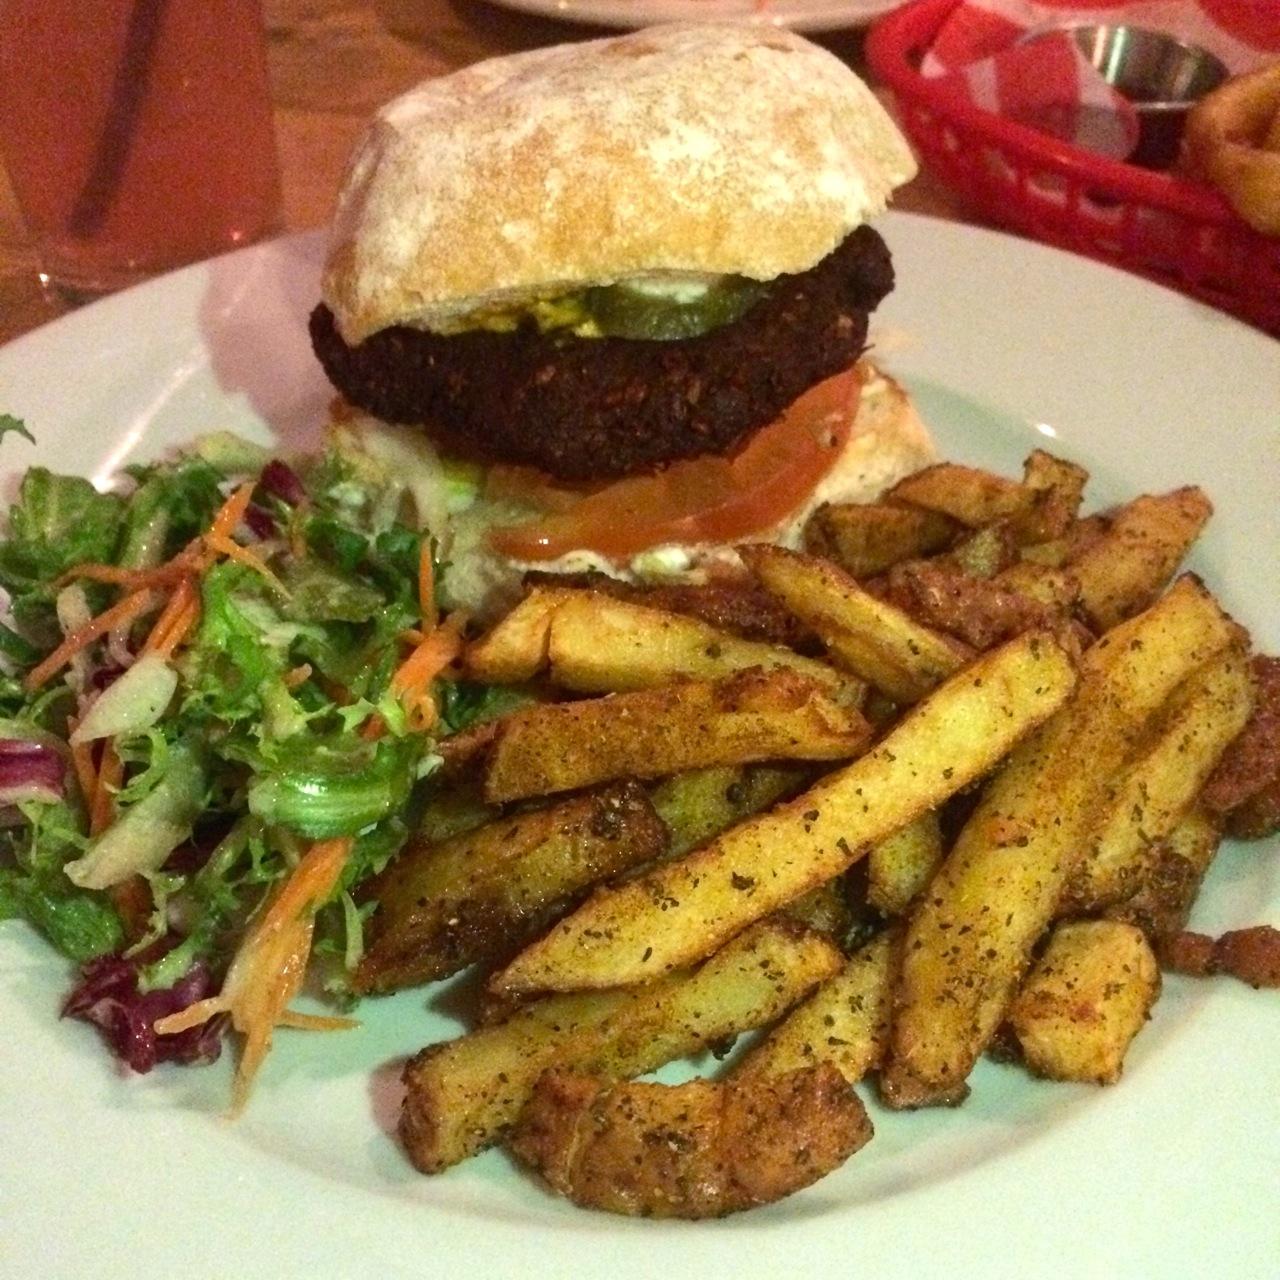 http://fatgayvegan.com/wp-content/uploads/2015/12/burger-and-chips.jpg